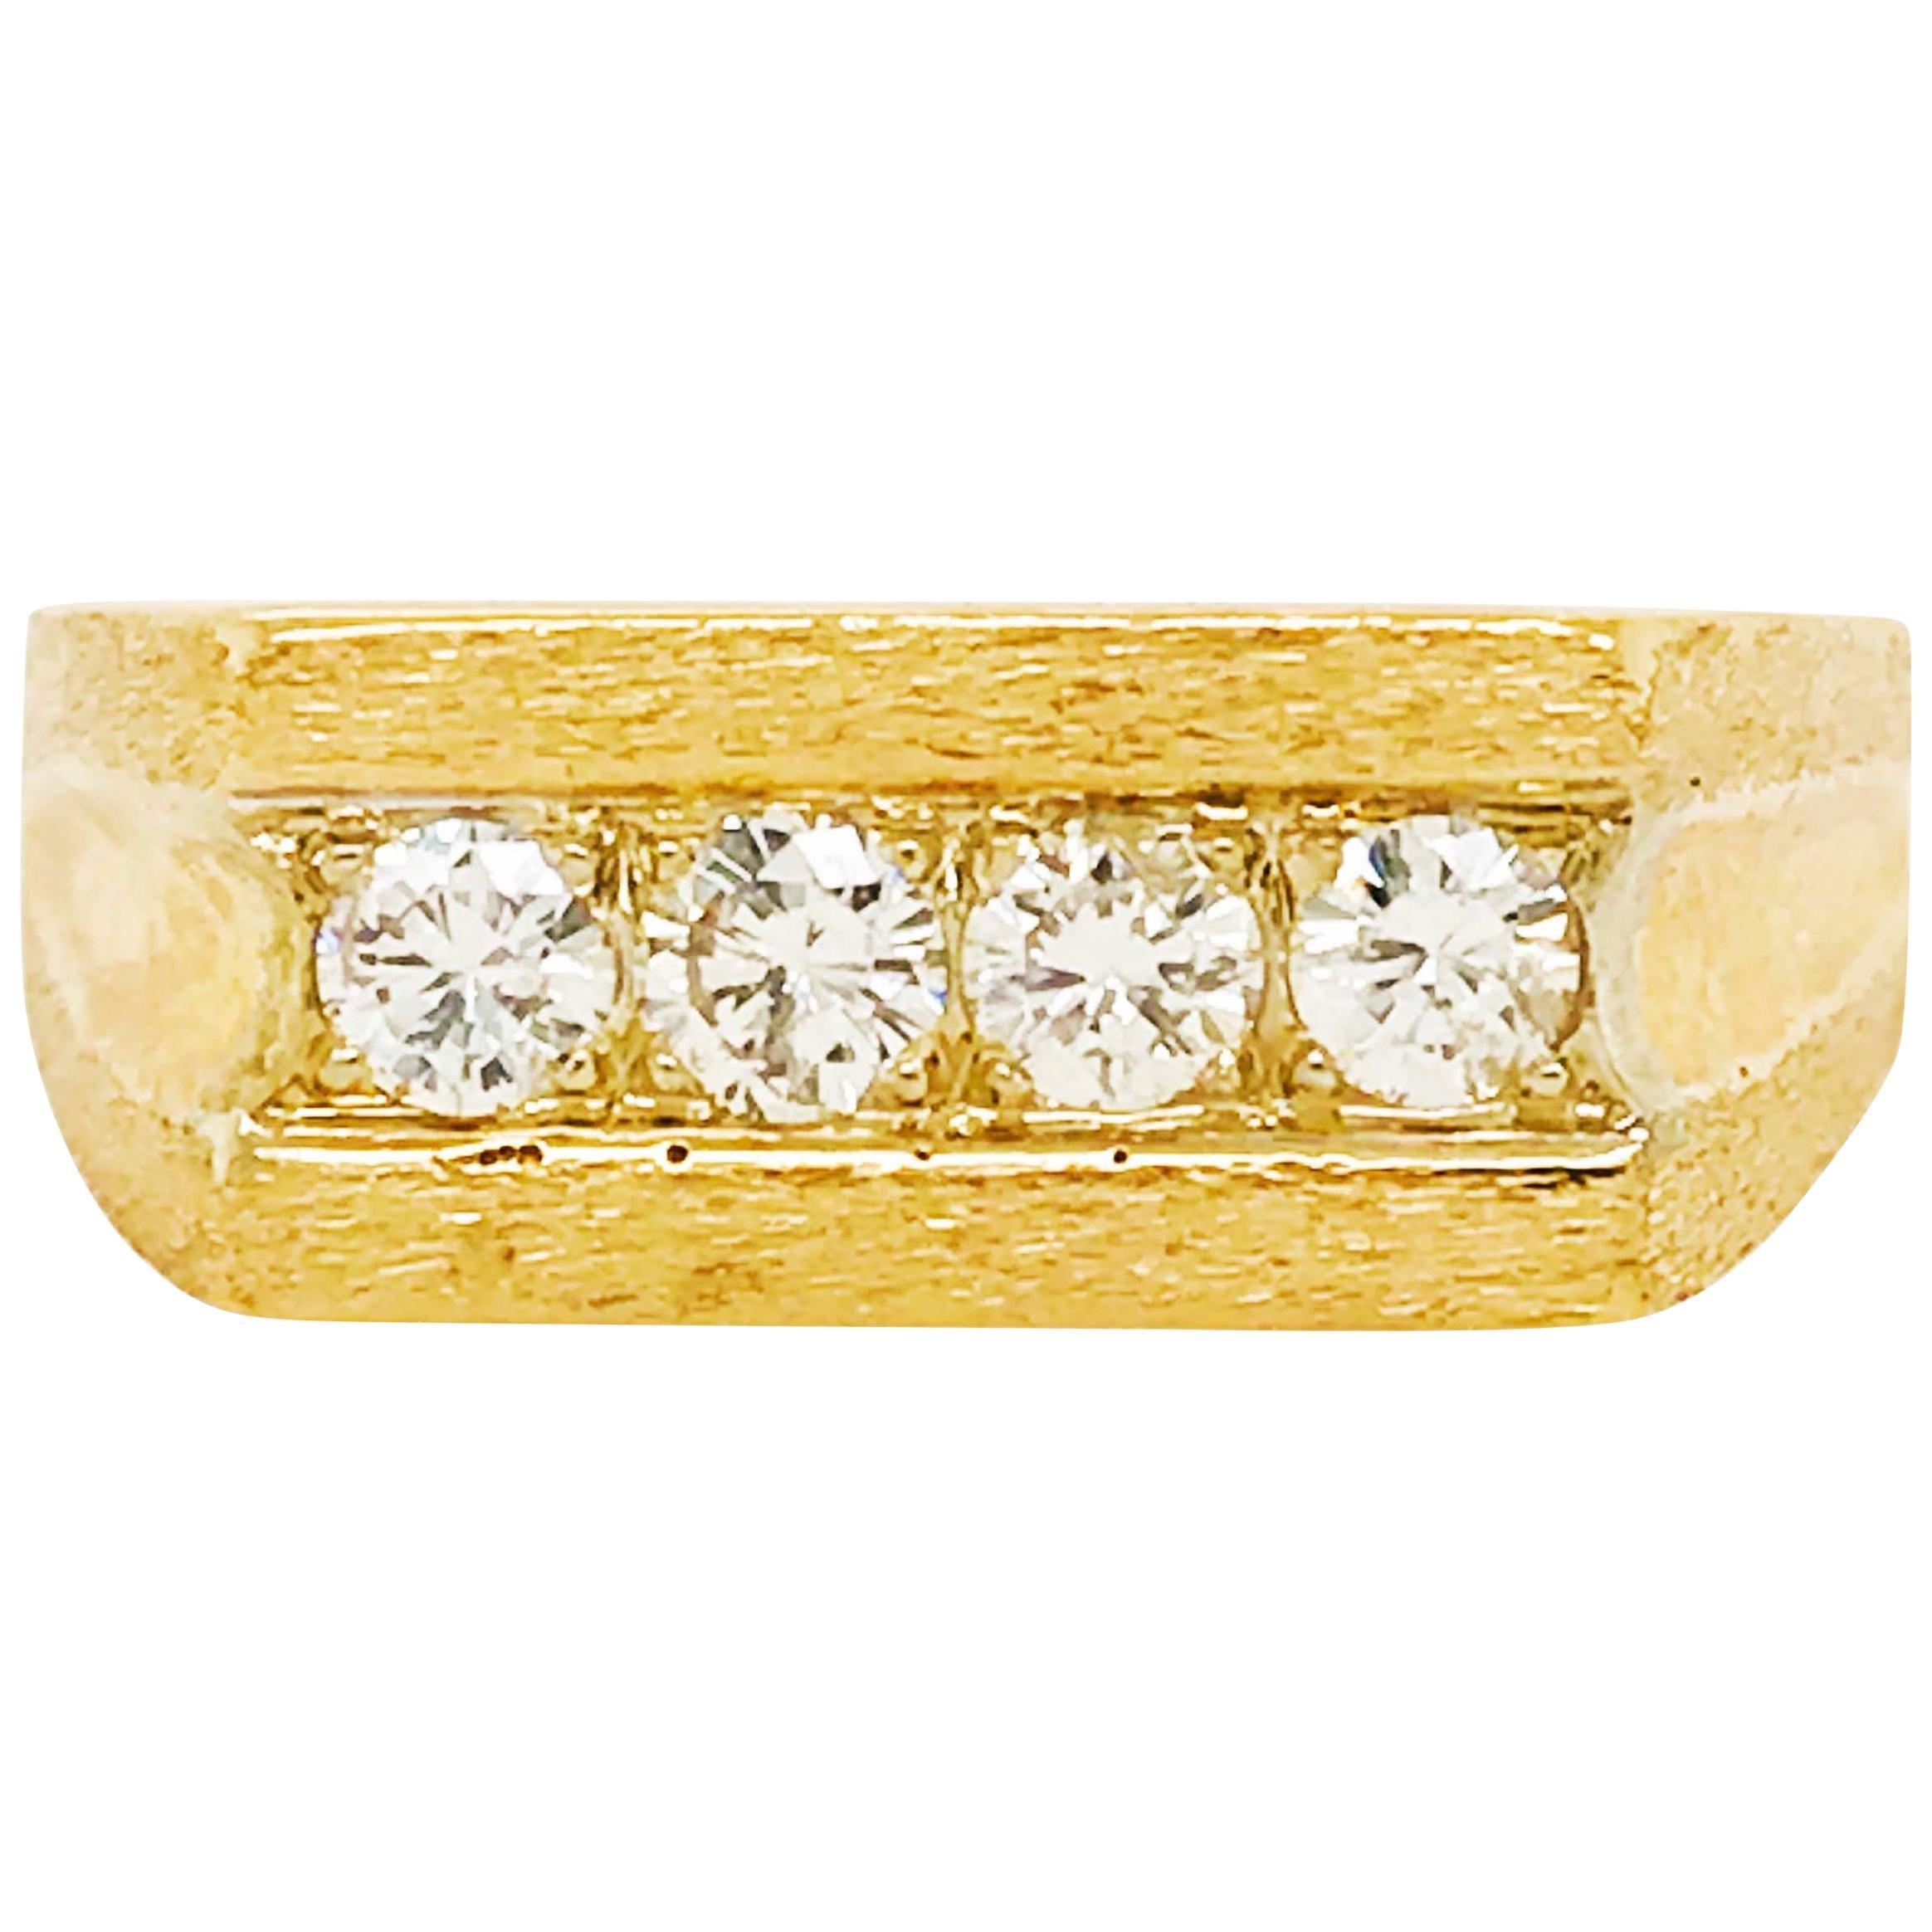 Diamond Men's Wedding Band, Custom Brushed Finish, 14K Yellow Gold, 3/4 Carat